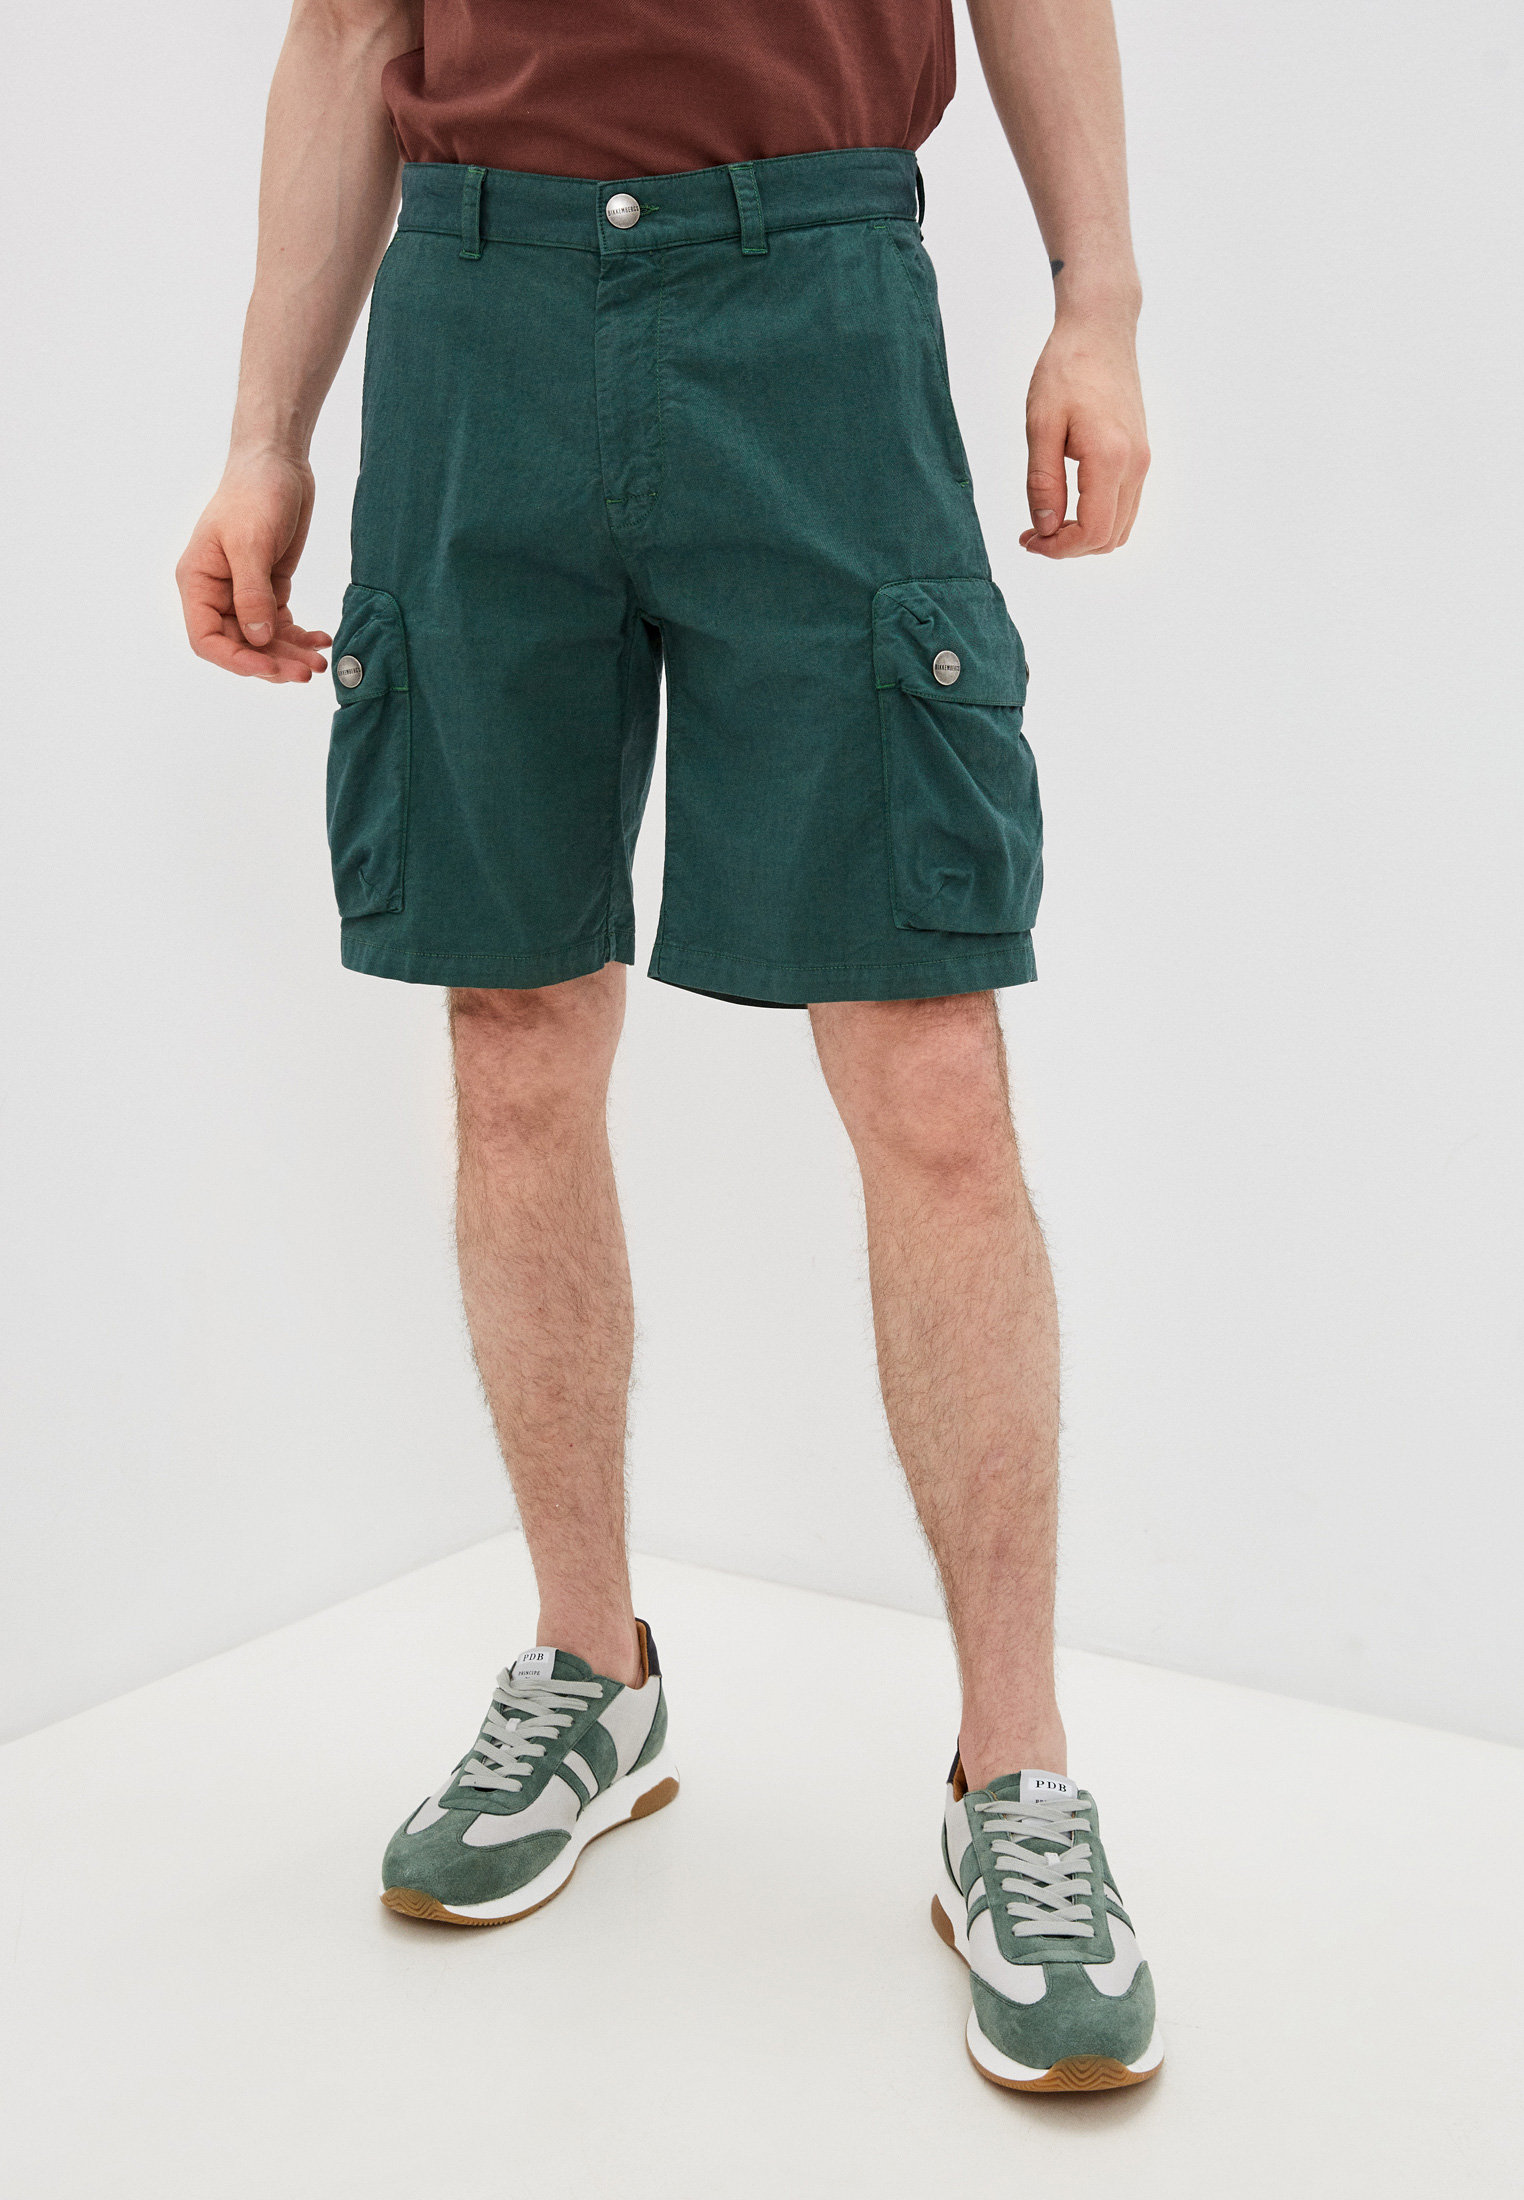 Мужские повседневные шорты Bikkembergs (Биккембергс) C O 006 00 S 3039